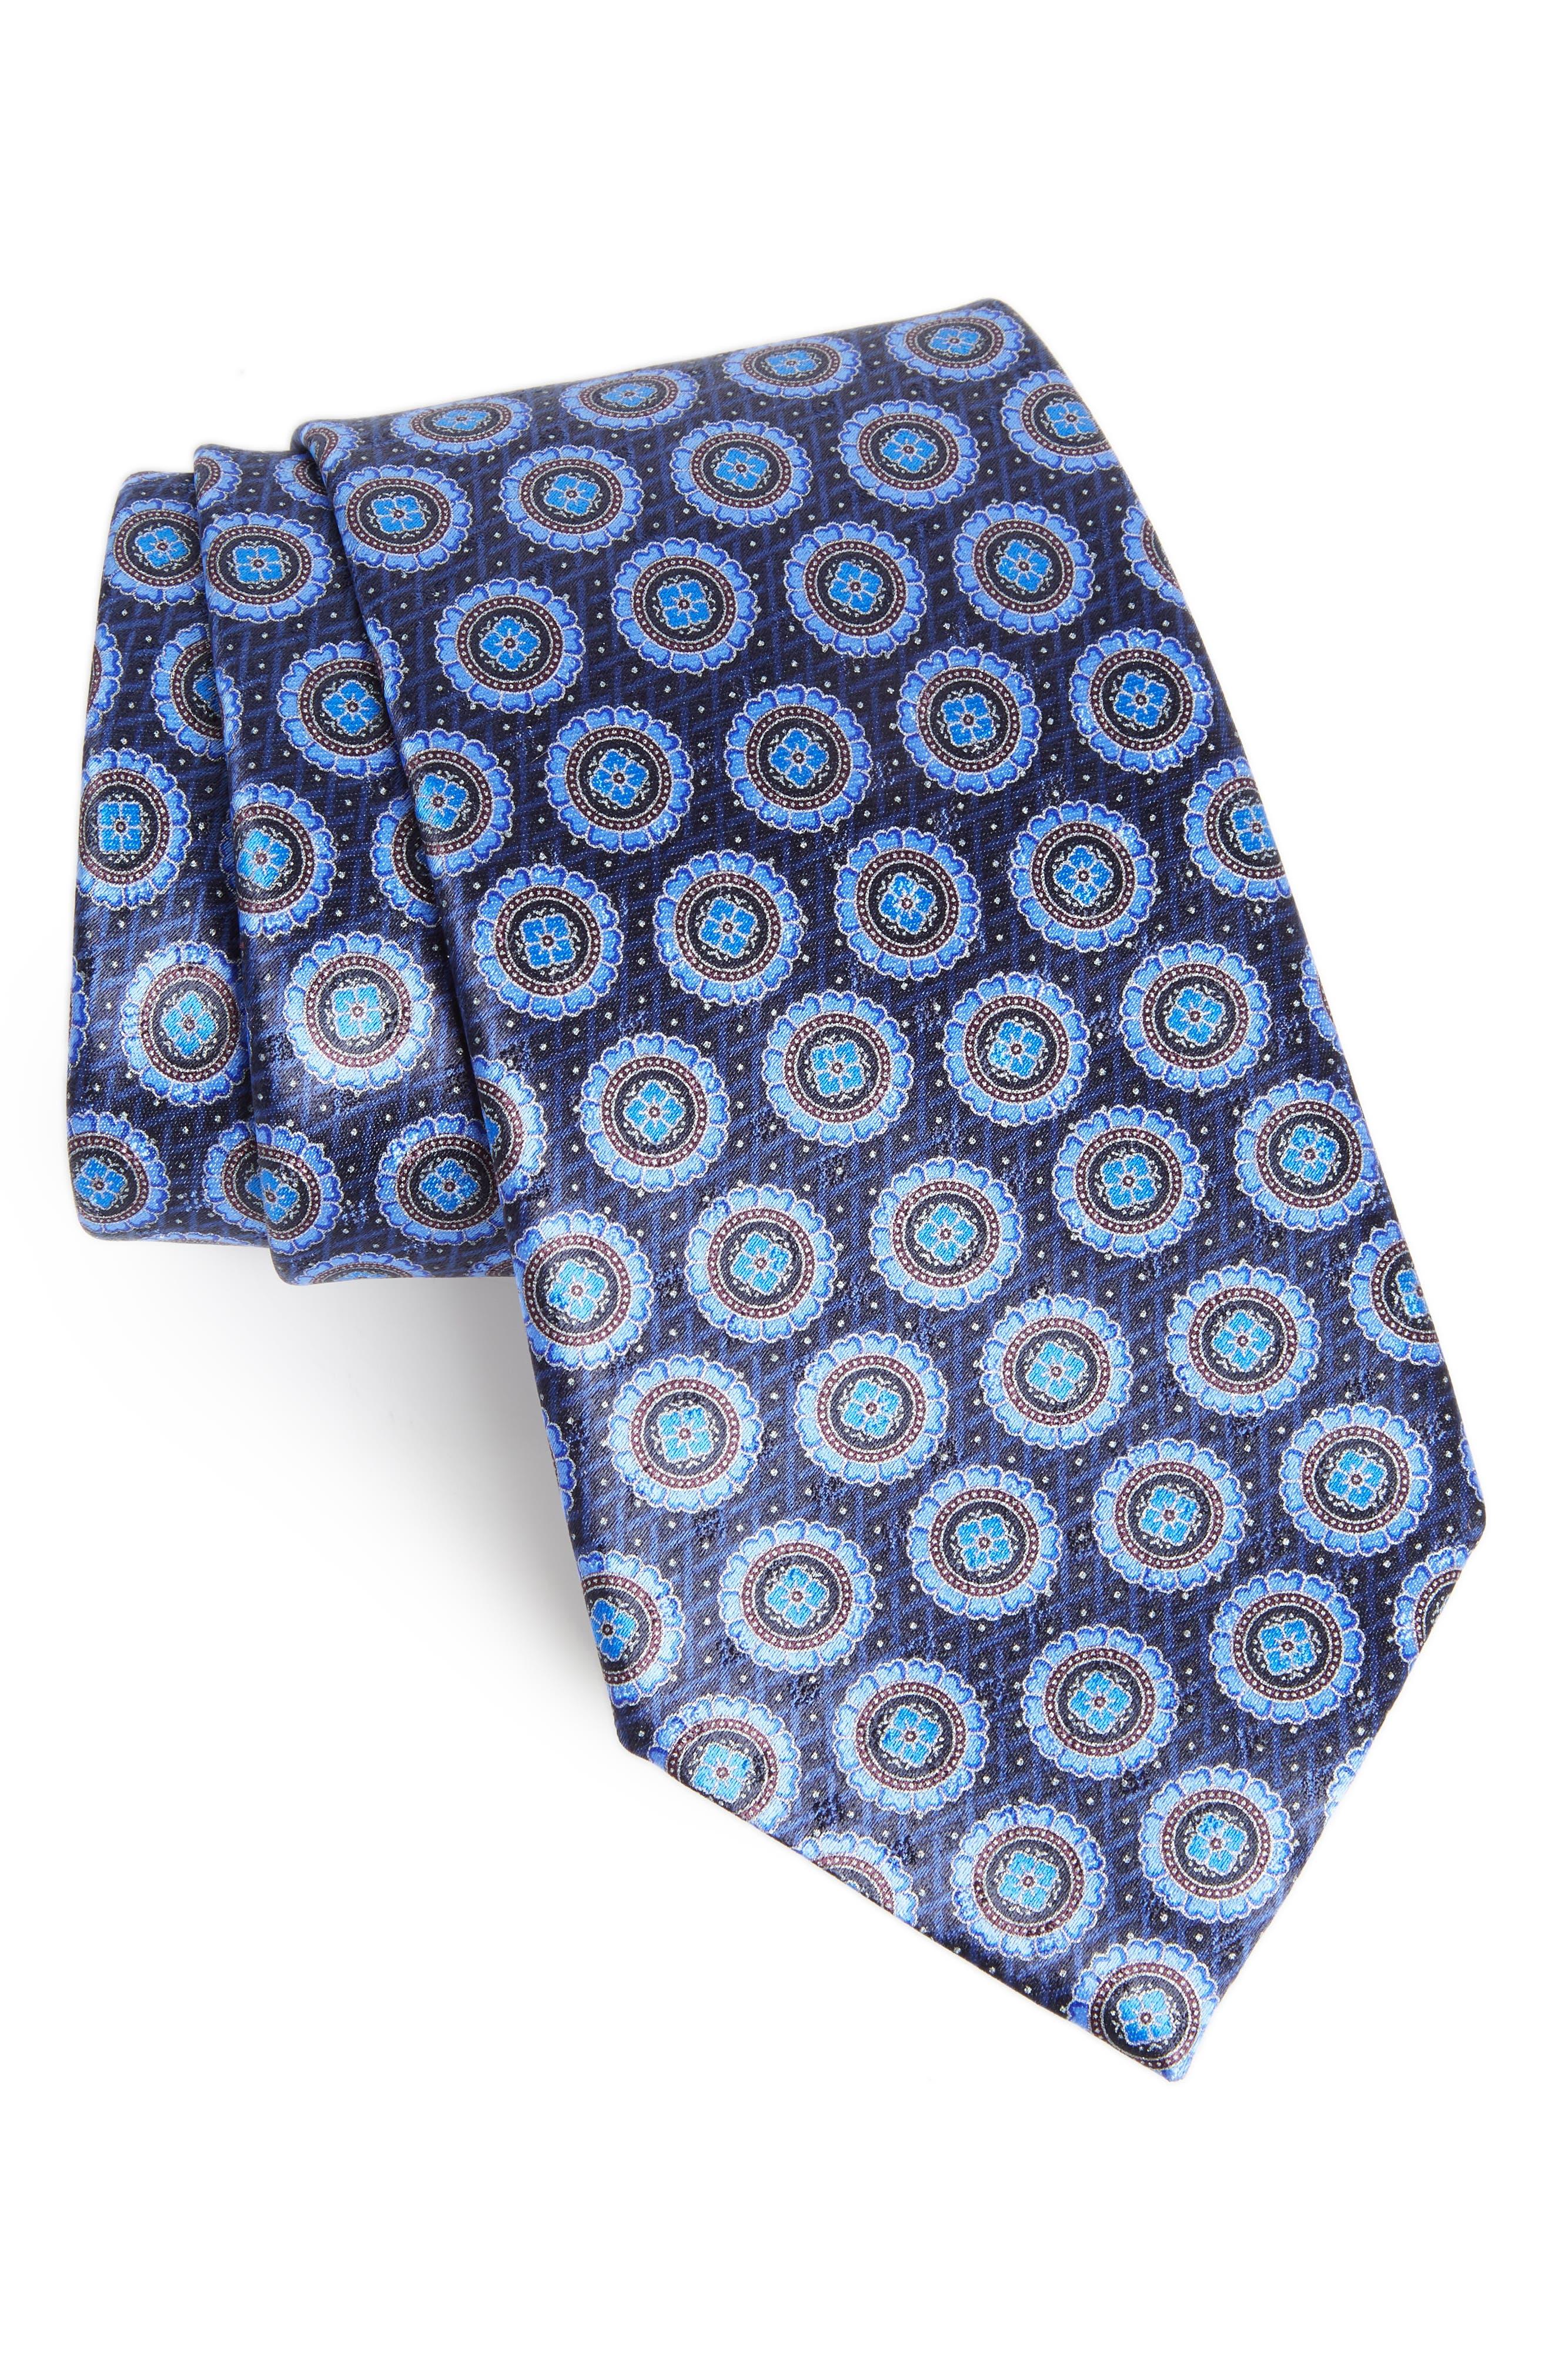 Ermenegildo Zenga Medallion Silk Tie,                             Main thumbnail 1, color,                             BLUE